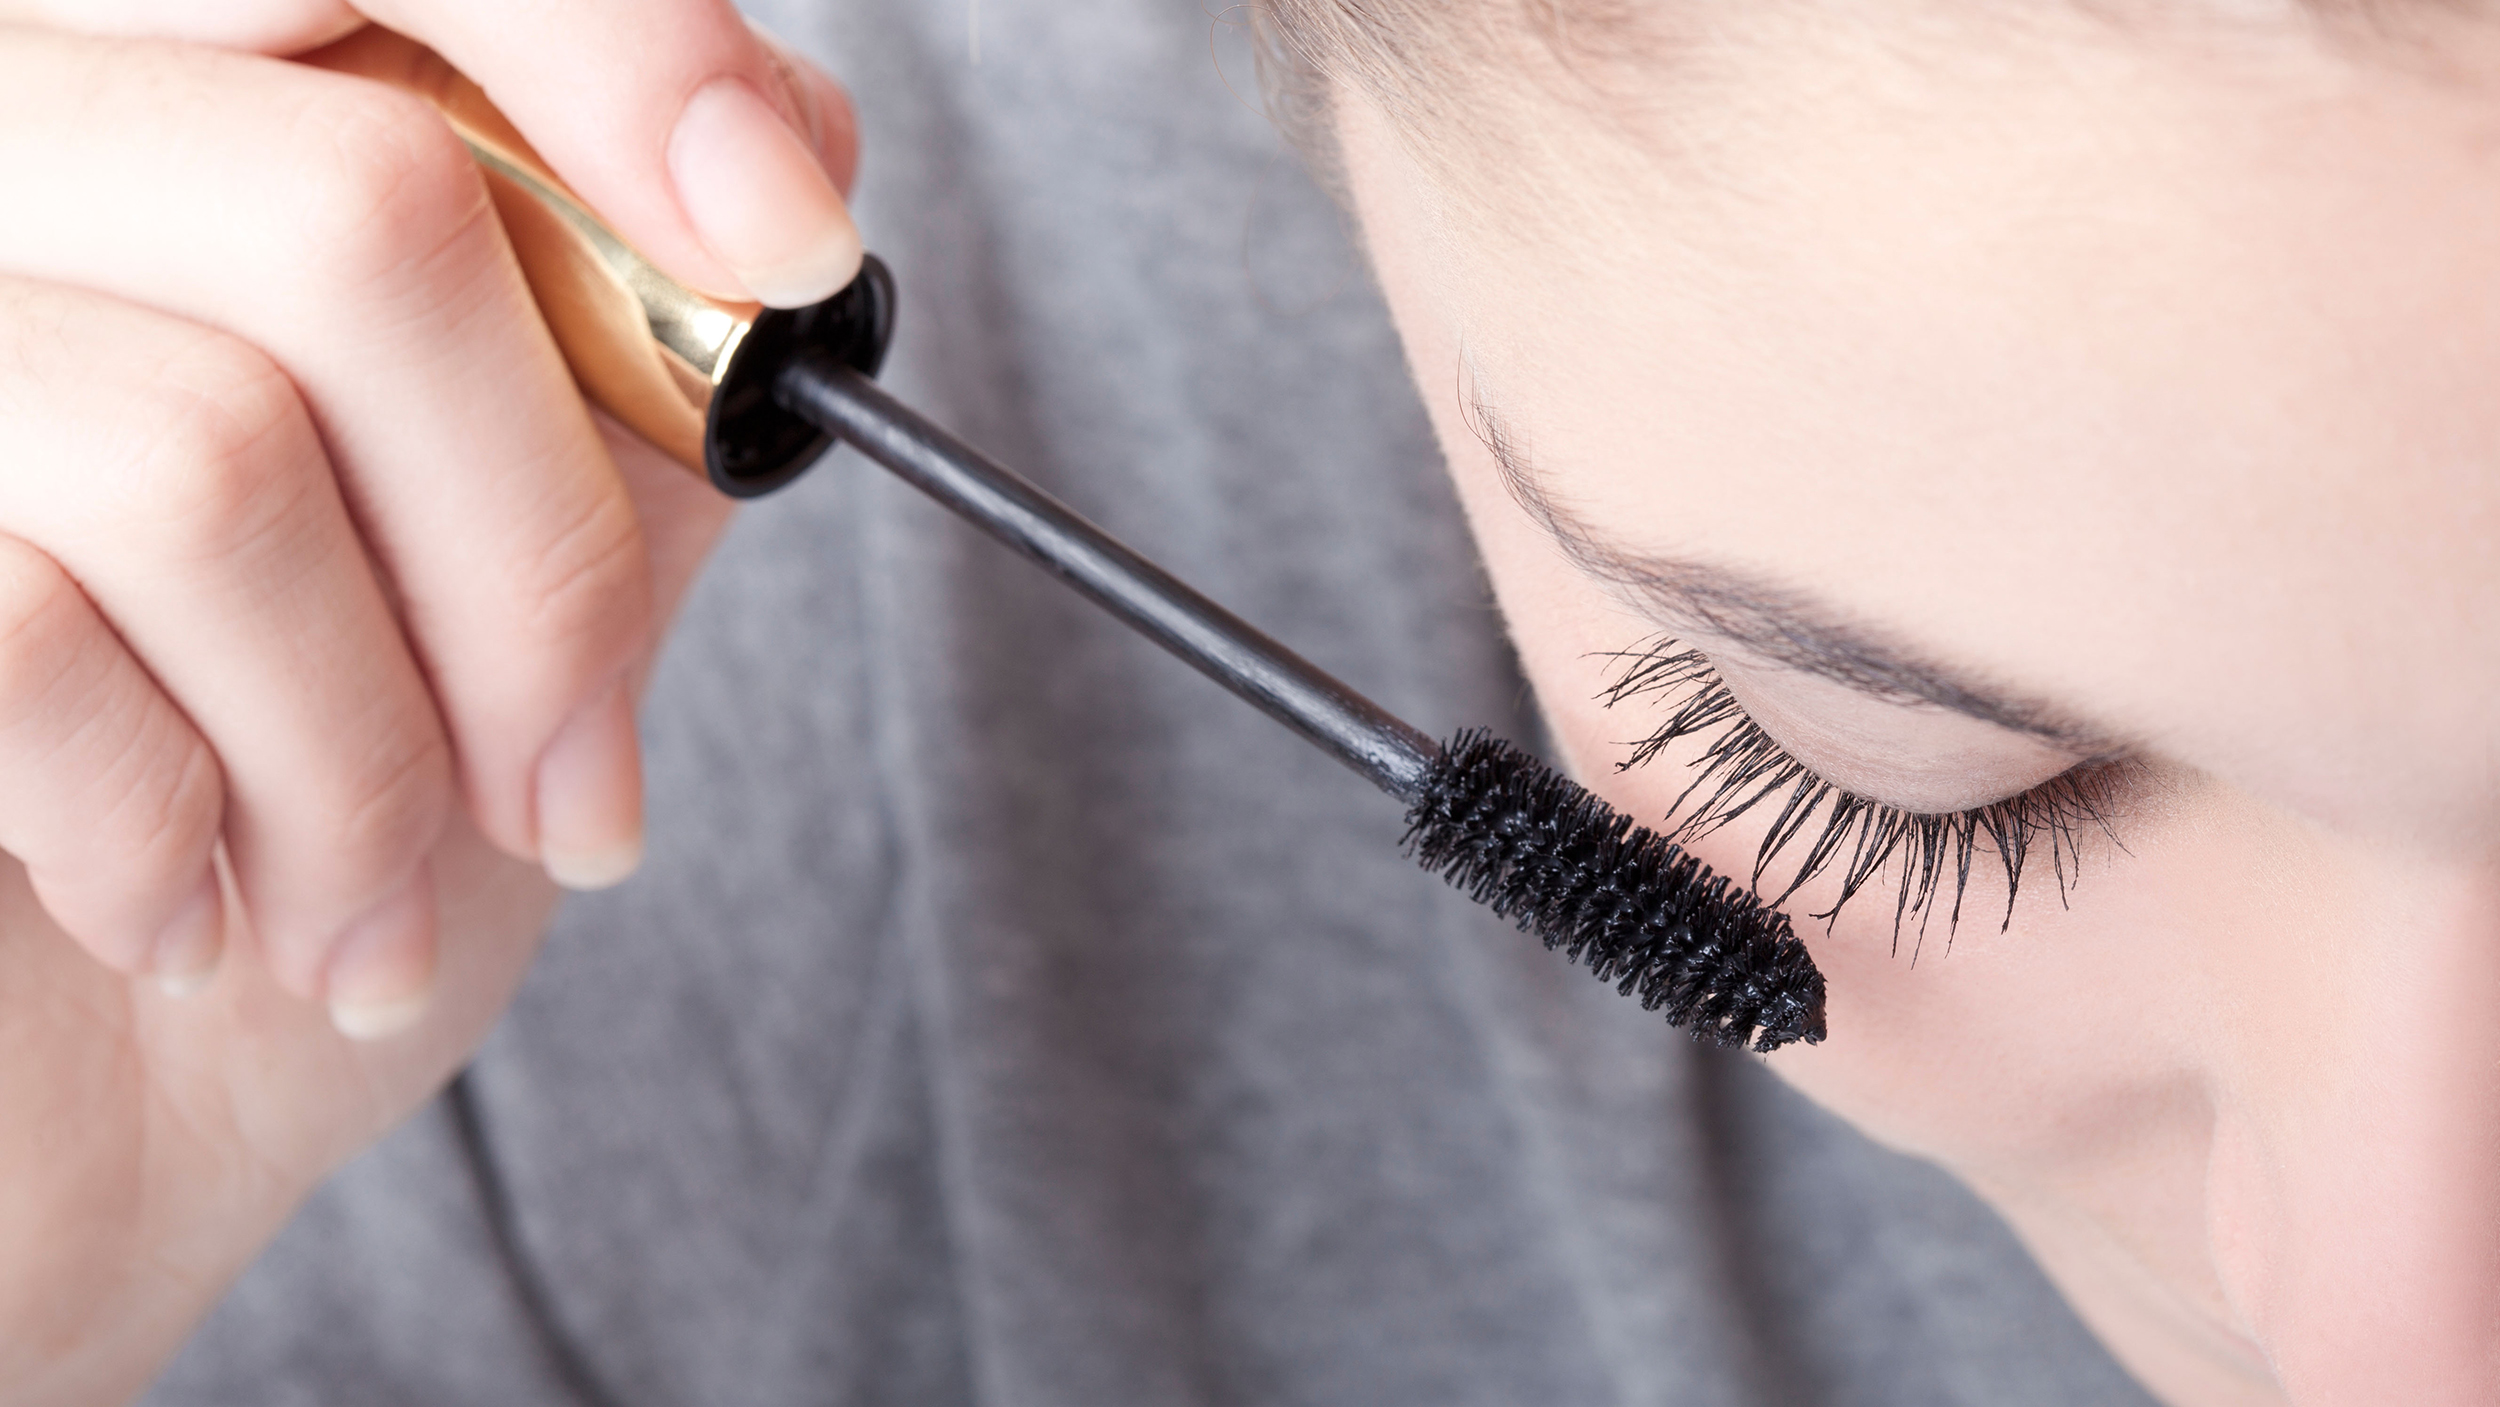 DTGHEP teenage girl applying mascara